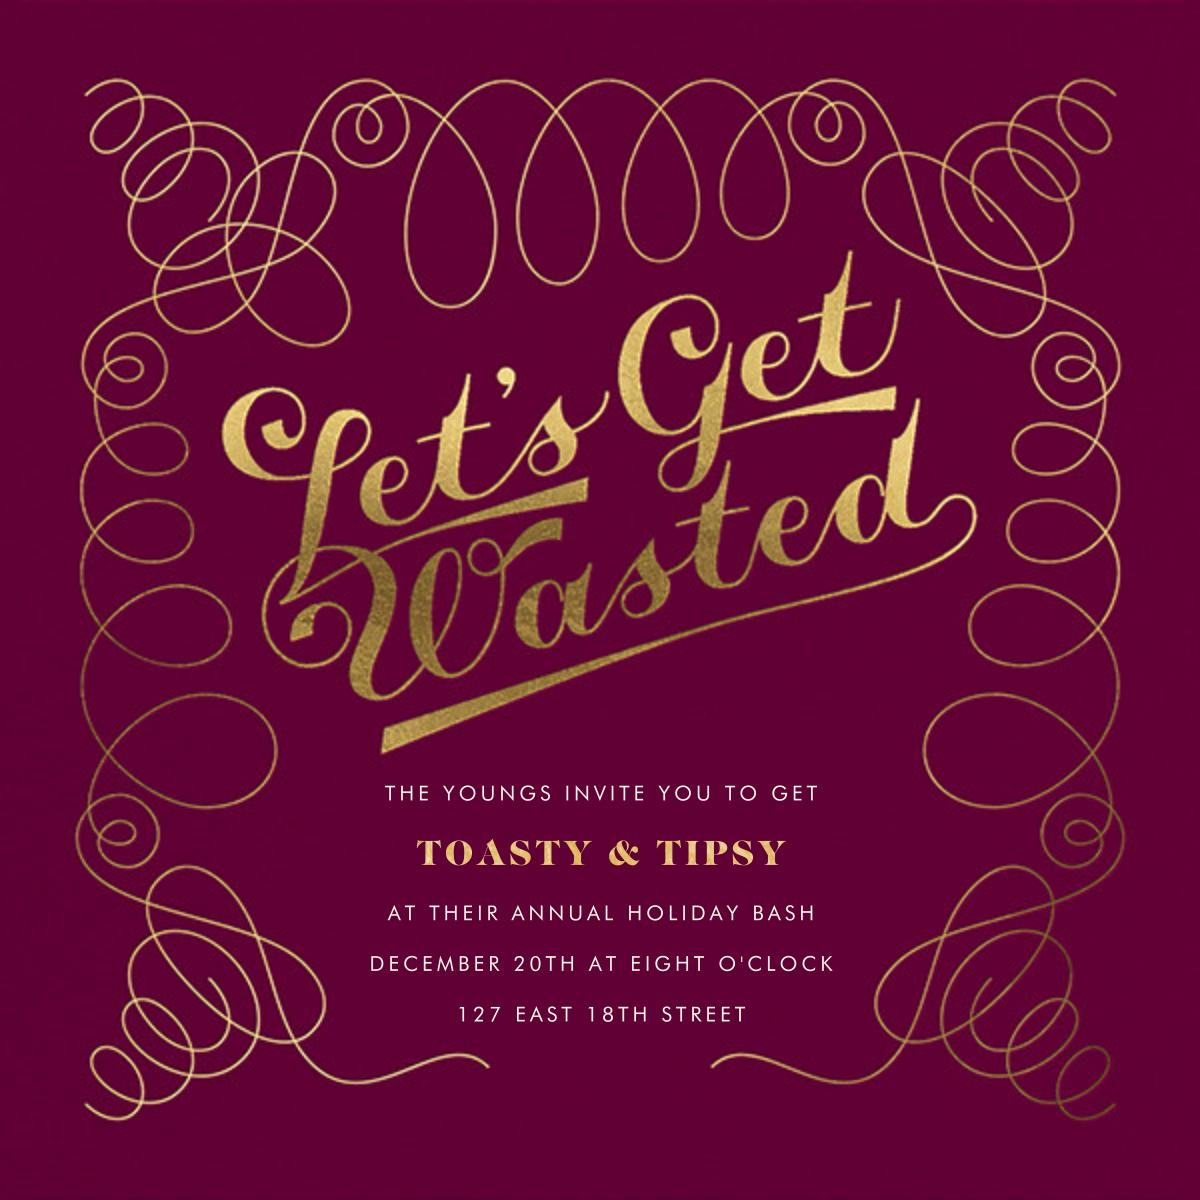 A Waste of an Invitation - Derek Blasberg - Holiday party